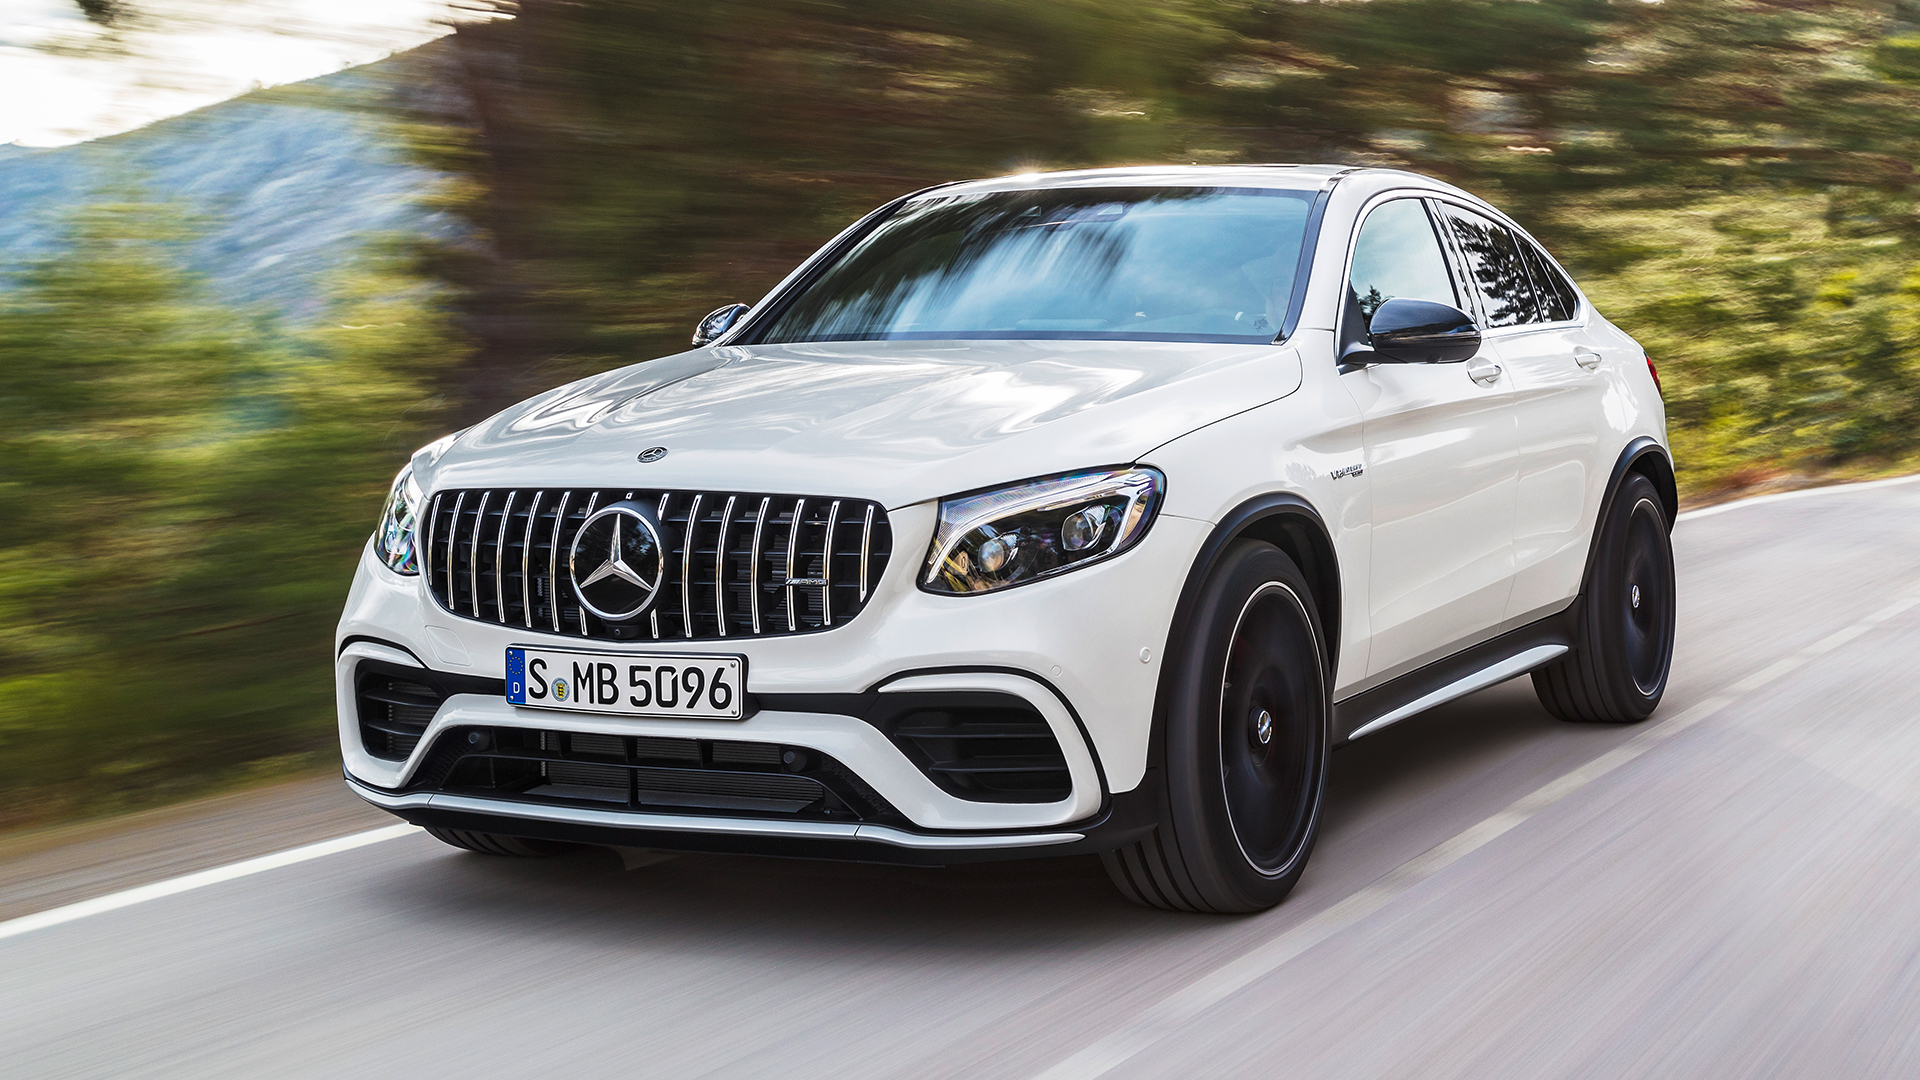 Autotrader Used Vans >> High-performance V8 model to top Mercedes GLC SUV range | Auto Trader UK